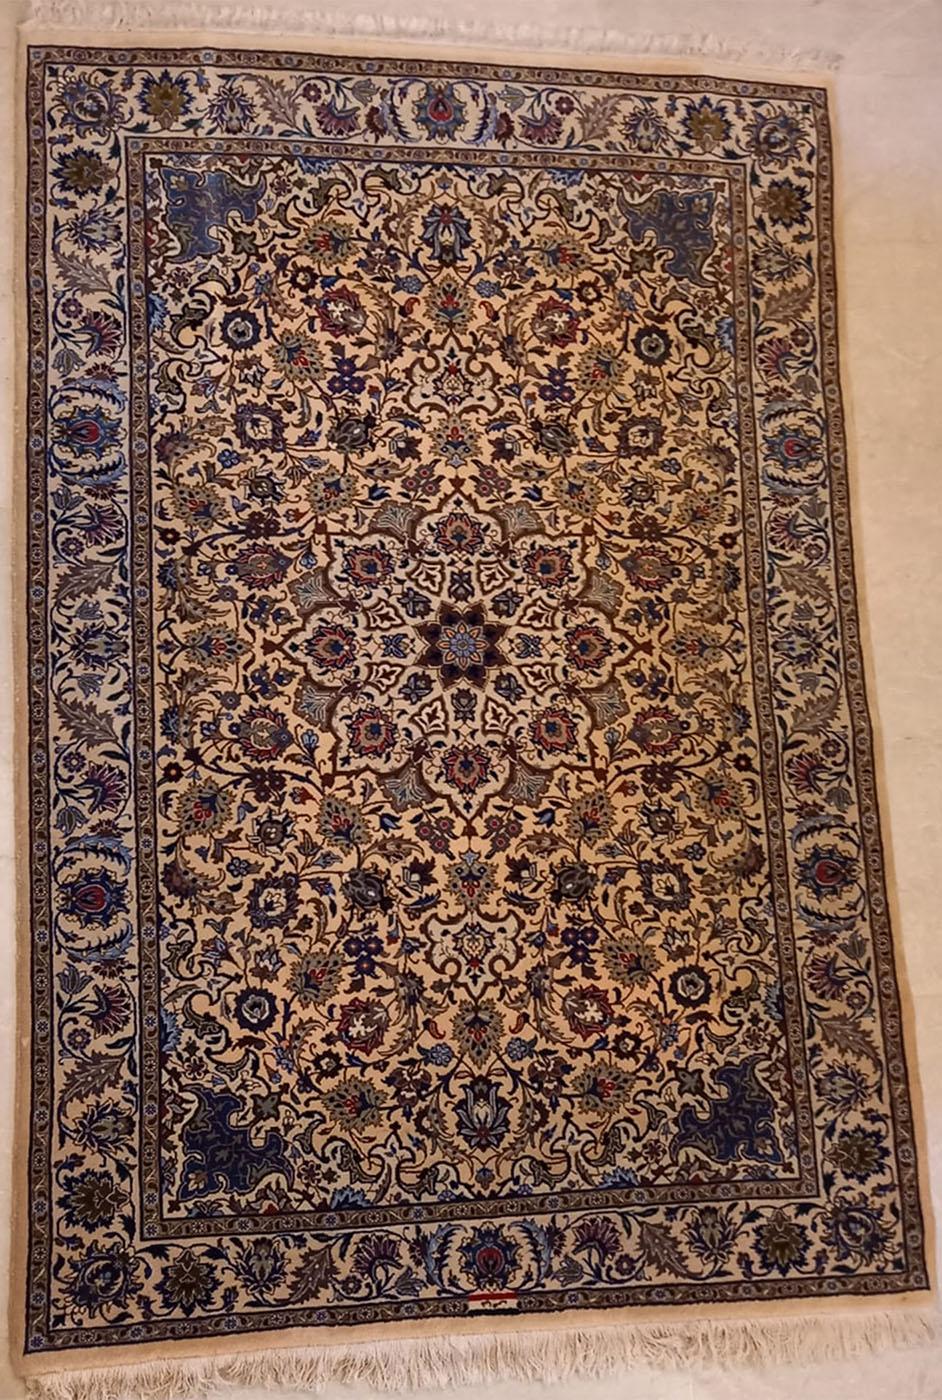 10808 Kashmar, Iran, firmato Fayaz, cm 253 x cm 167.